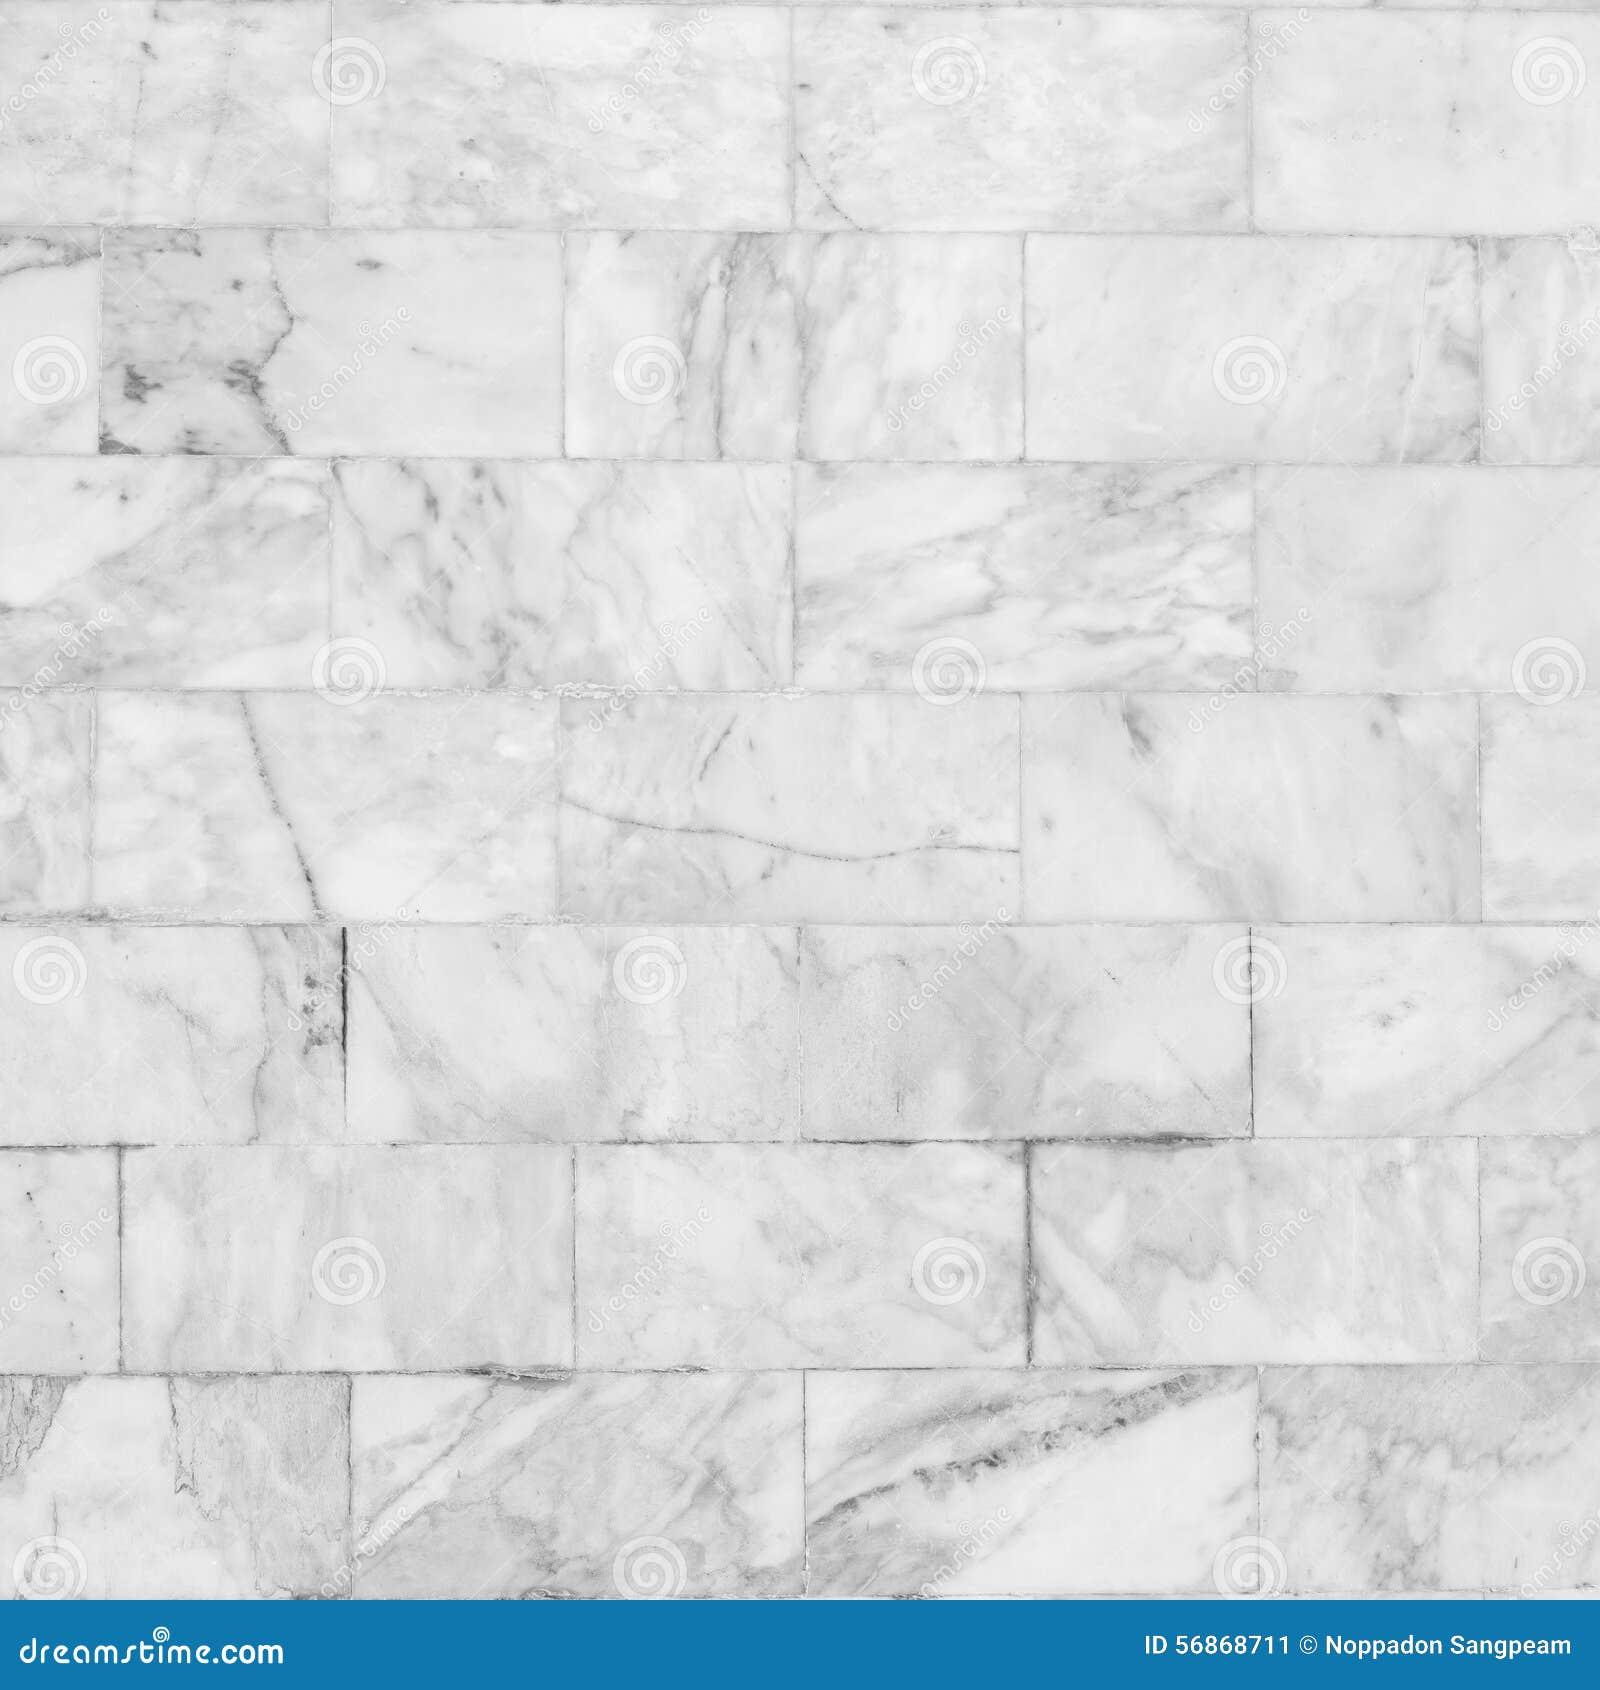 White Marble Tiles Seamless Flooring Texture For